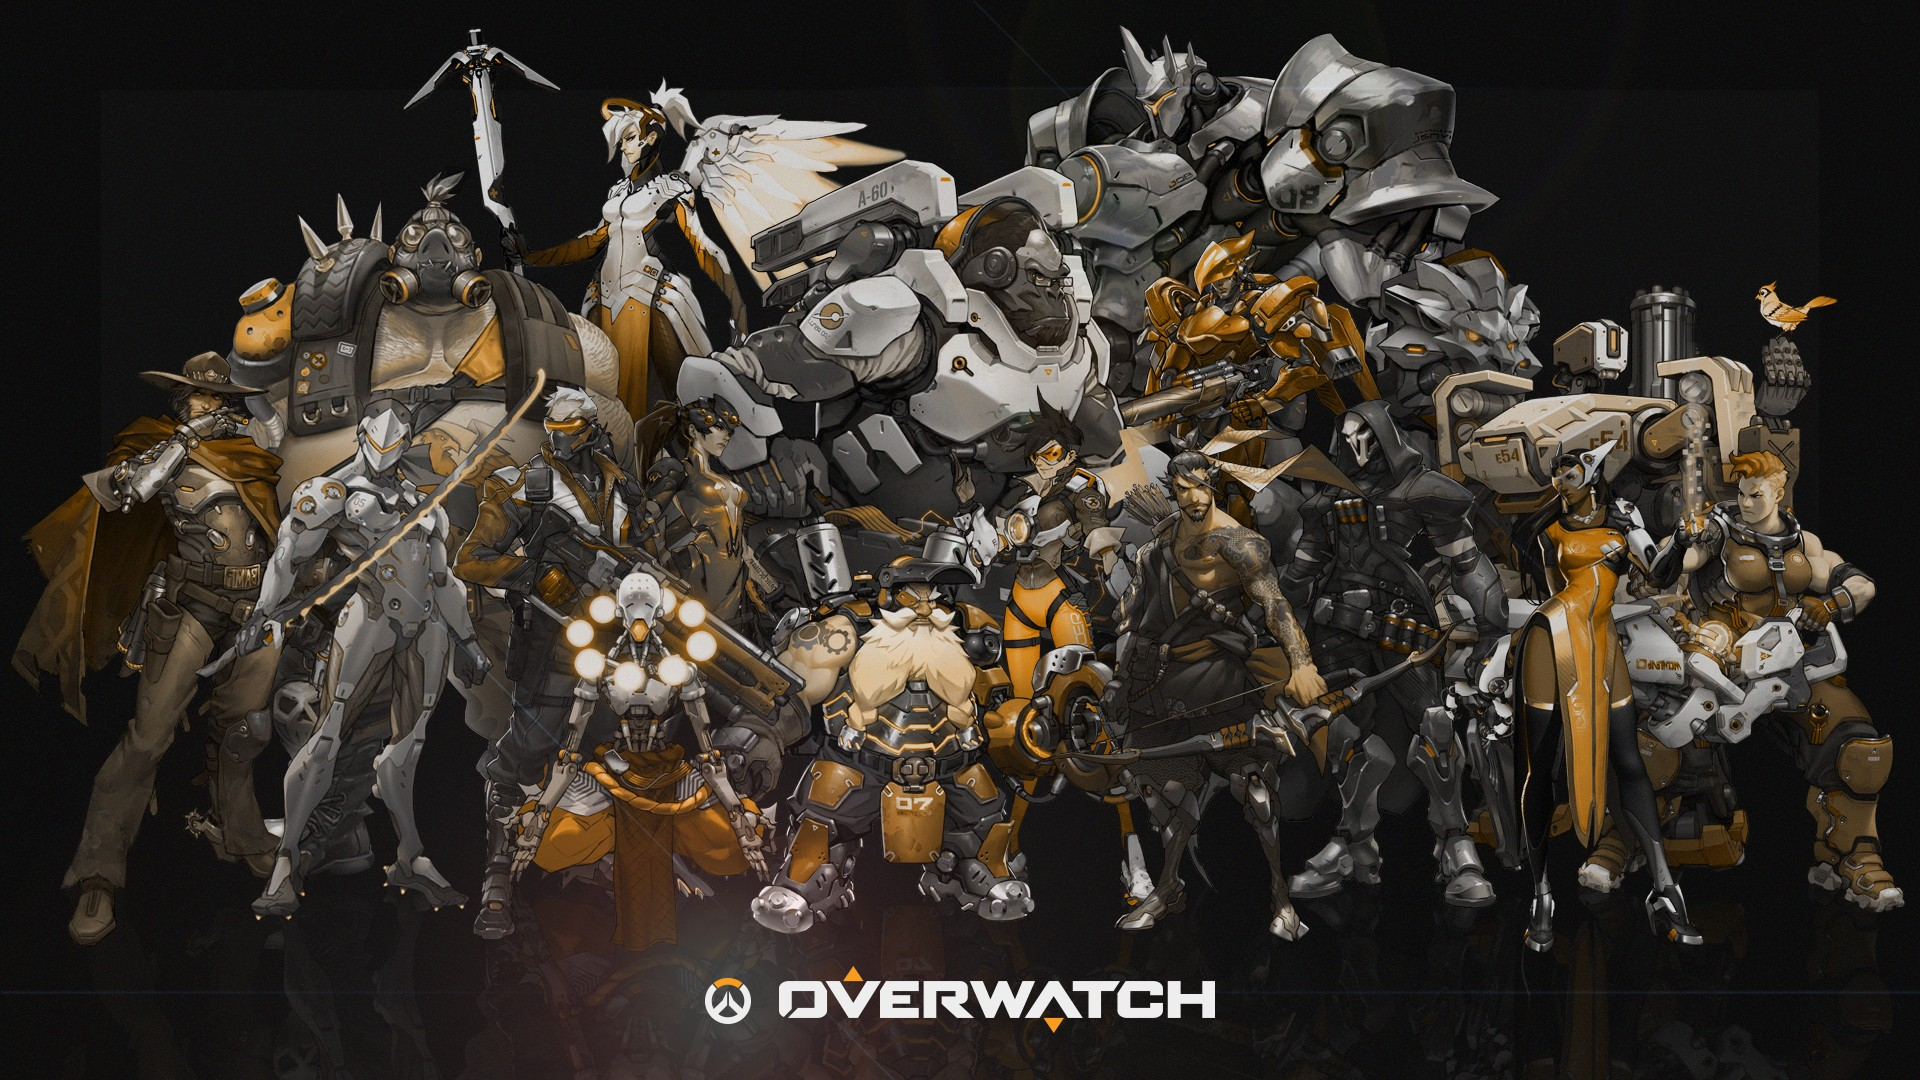 Overwatch HD Wallpaper - WallpaperSafari